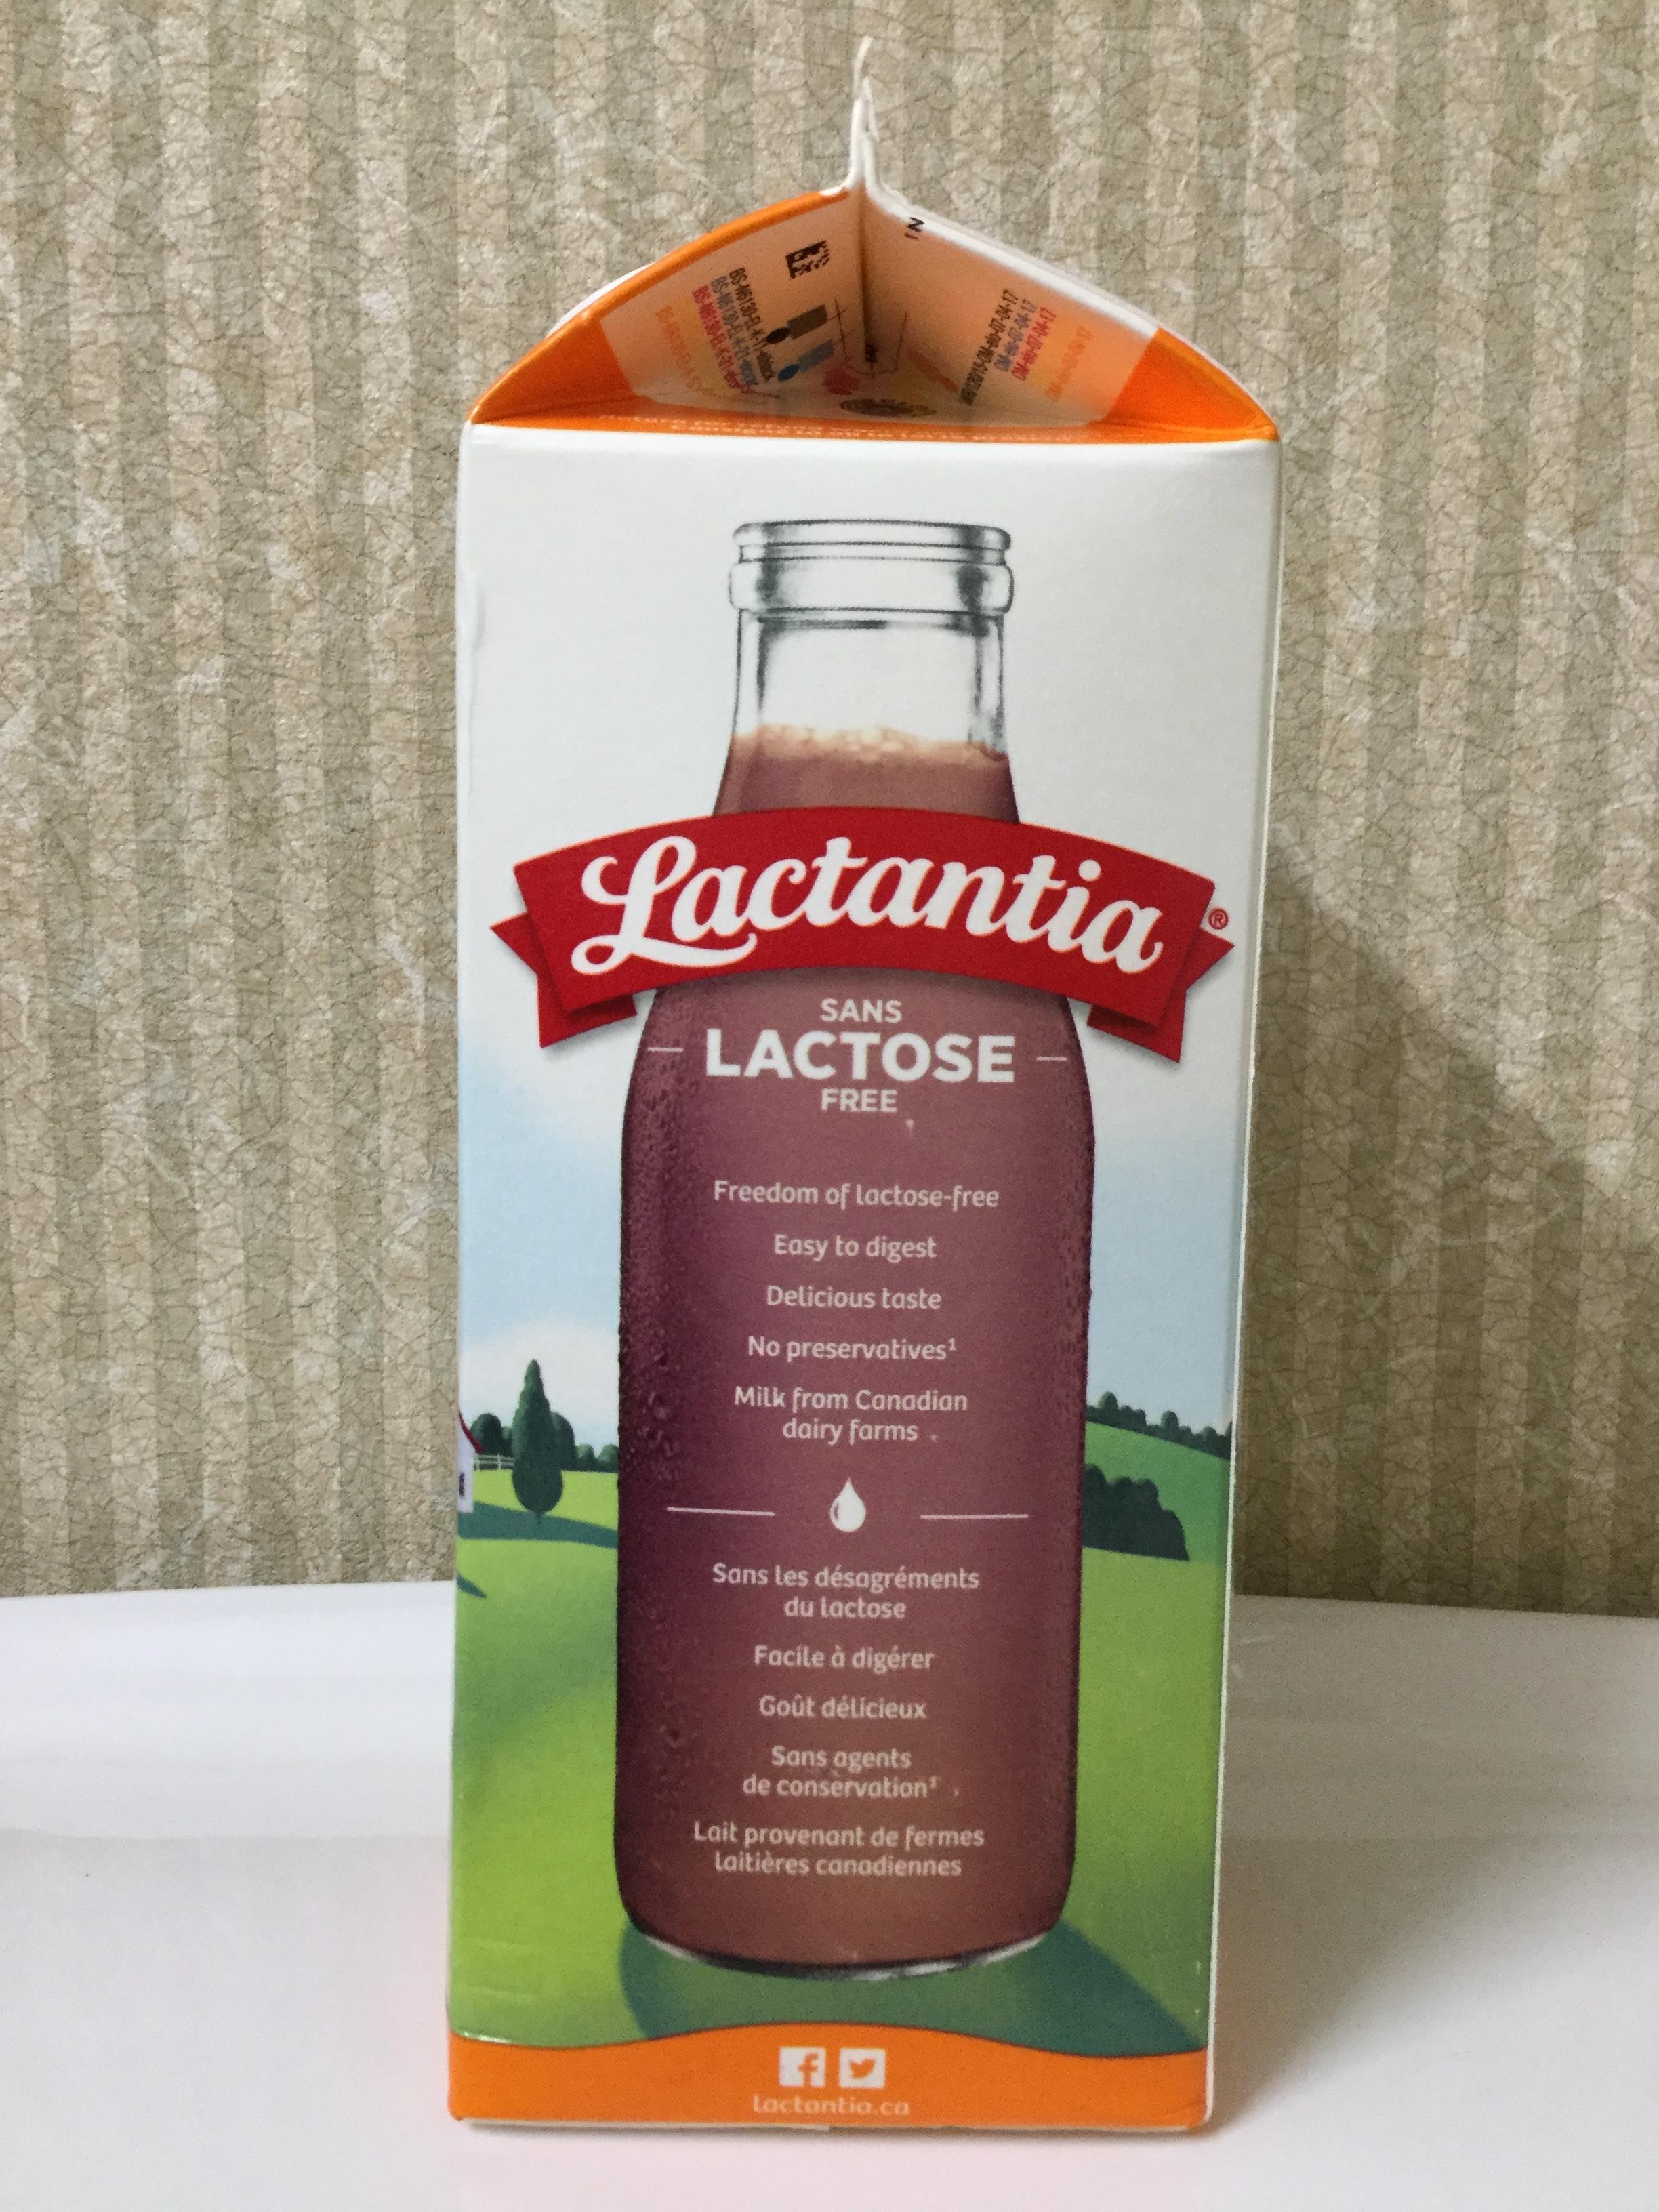 Lactantia Lactose Free Chocolate Milk Side 3